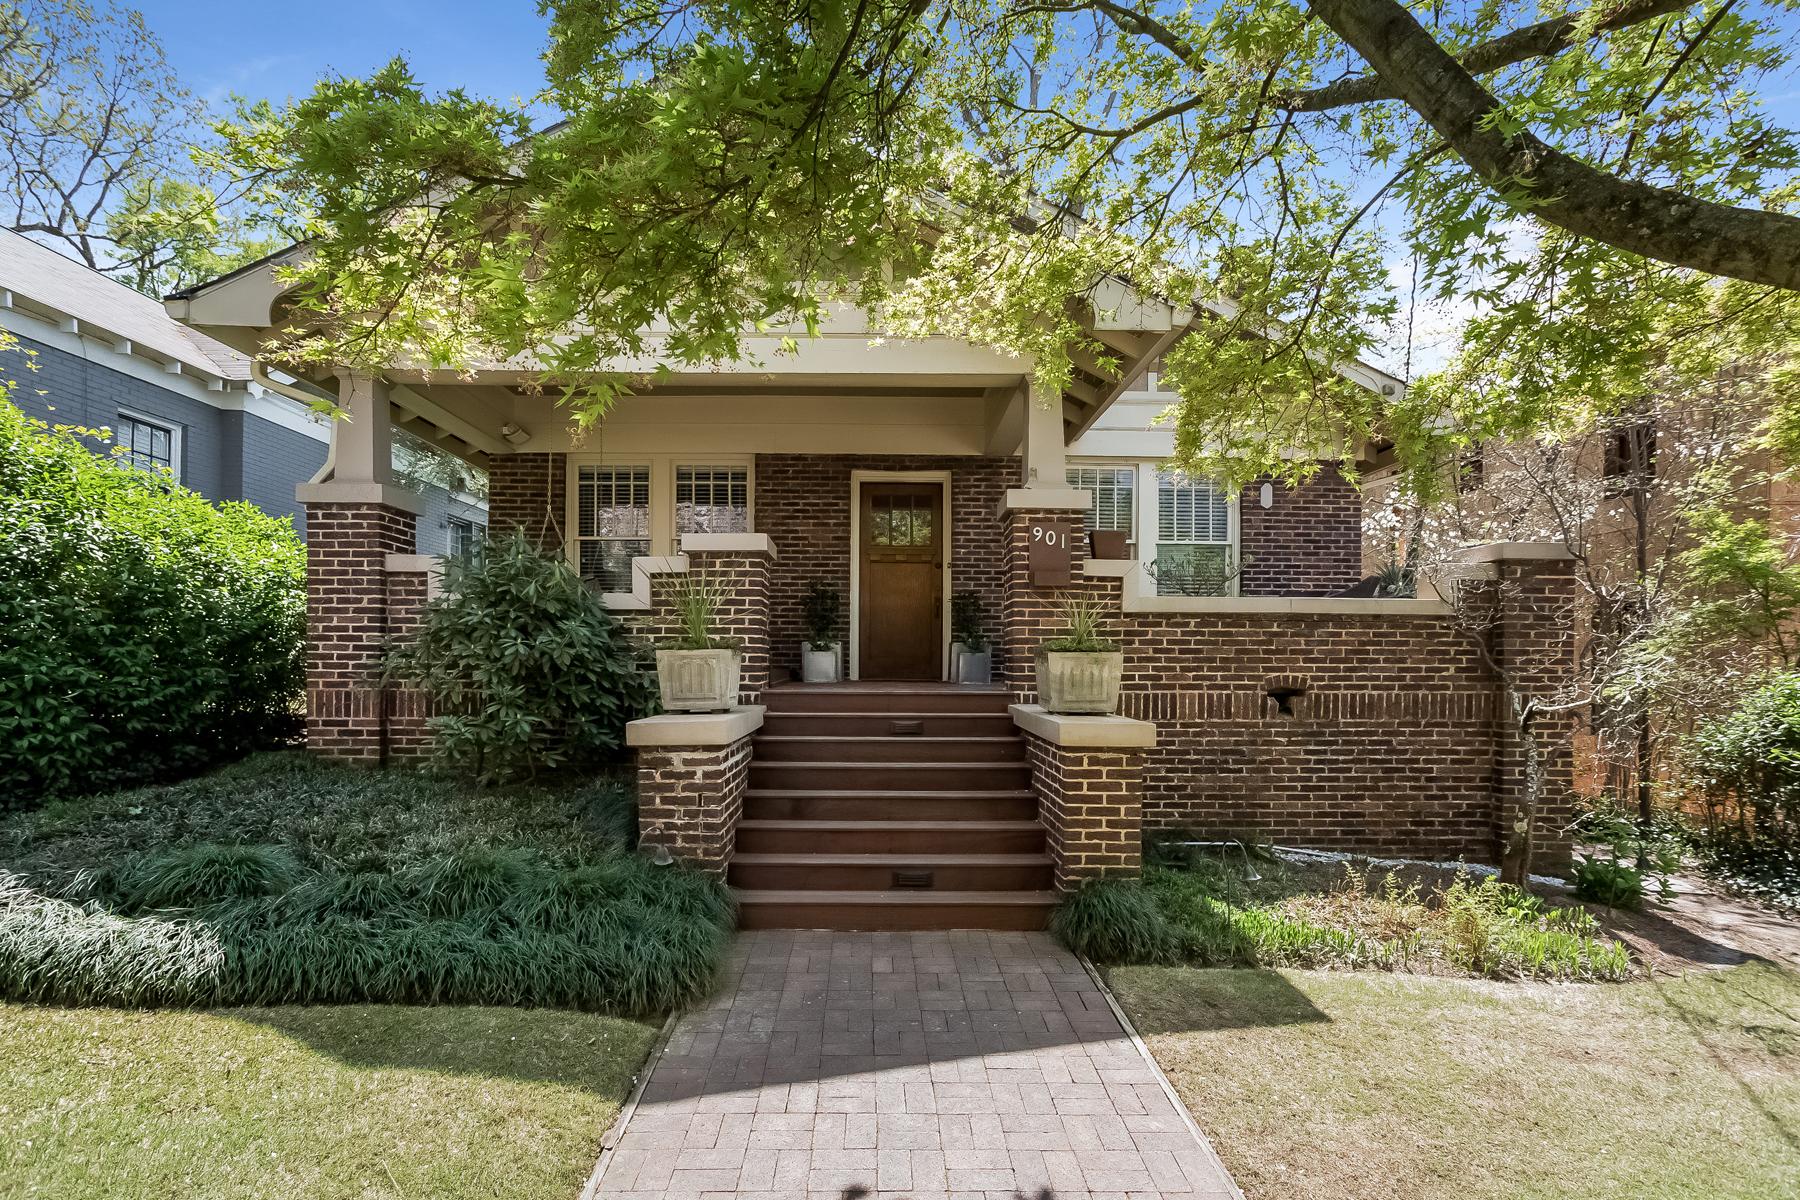 Single Family Home for Sale at Renovated Virginia Highland Bungalow 901 Adair Avenue NE Virginia Highland, Atlanta, Georgia, 30306 United States